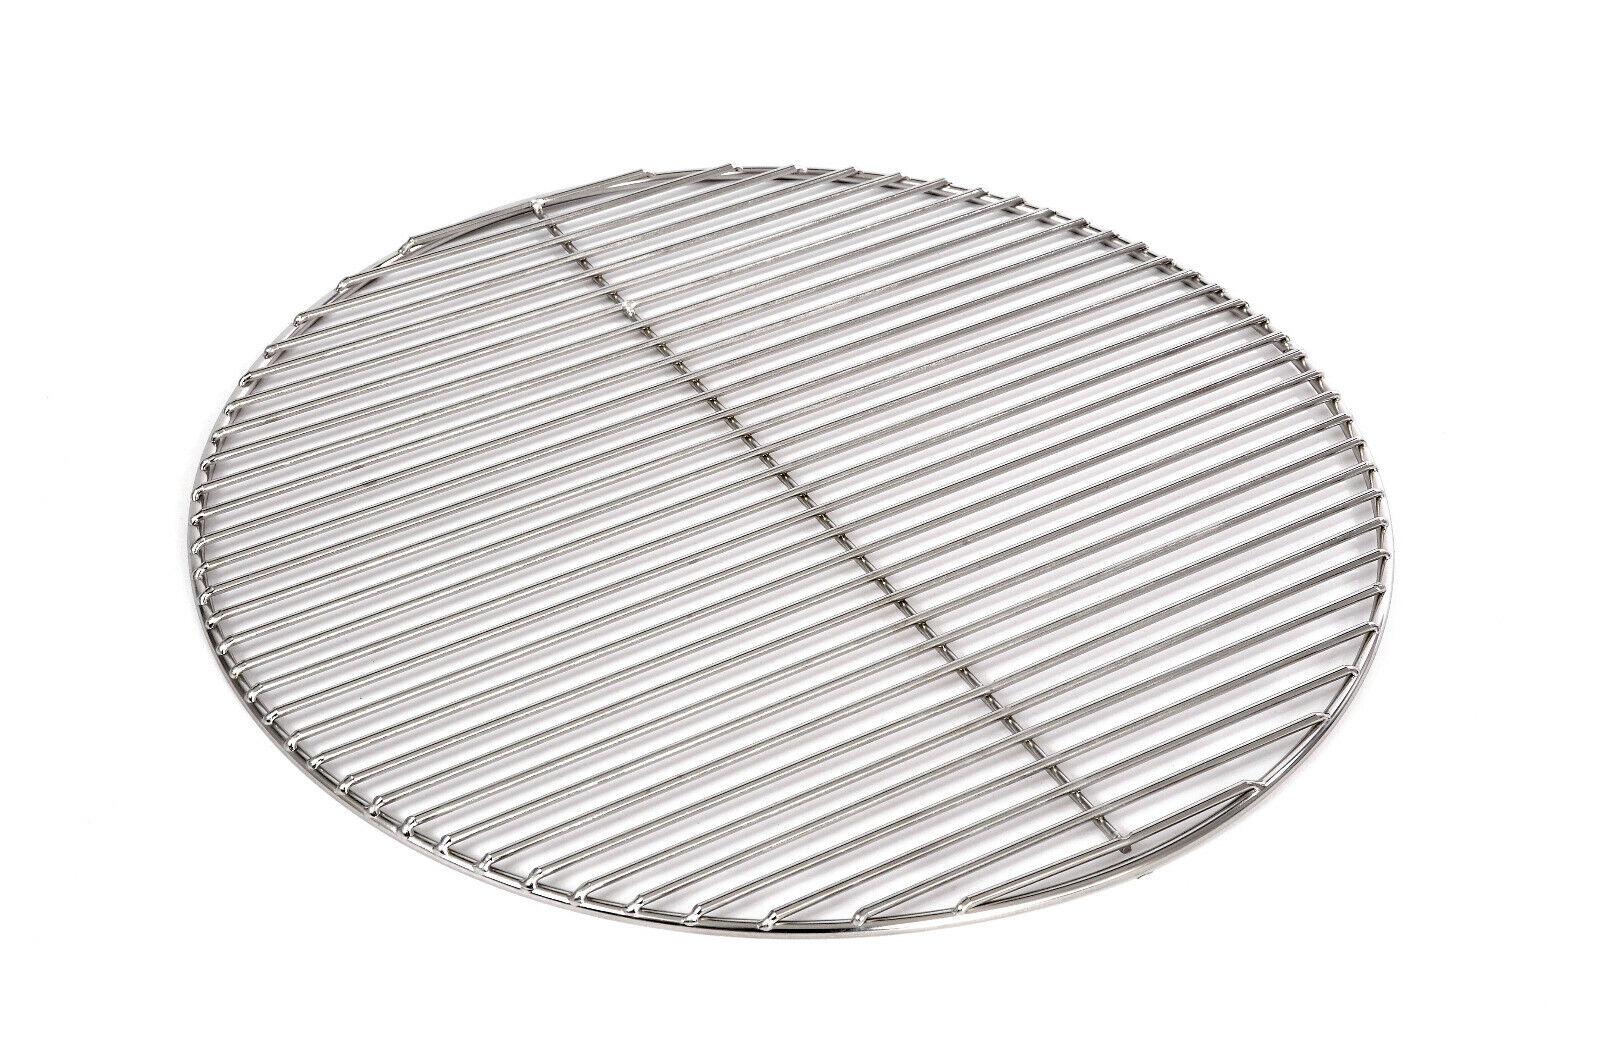 Grillrost rund Edelstahl Ø 4 mm /10 mm Grillrostabstand 34,5 40 44,5 47 54 57 cm